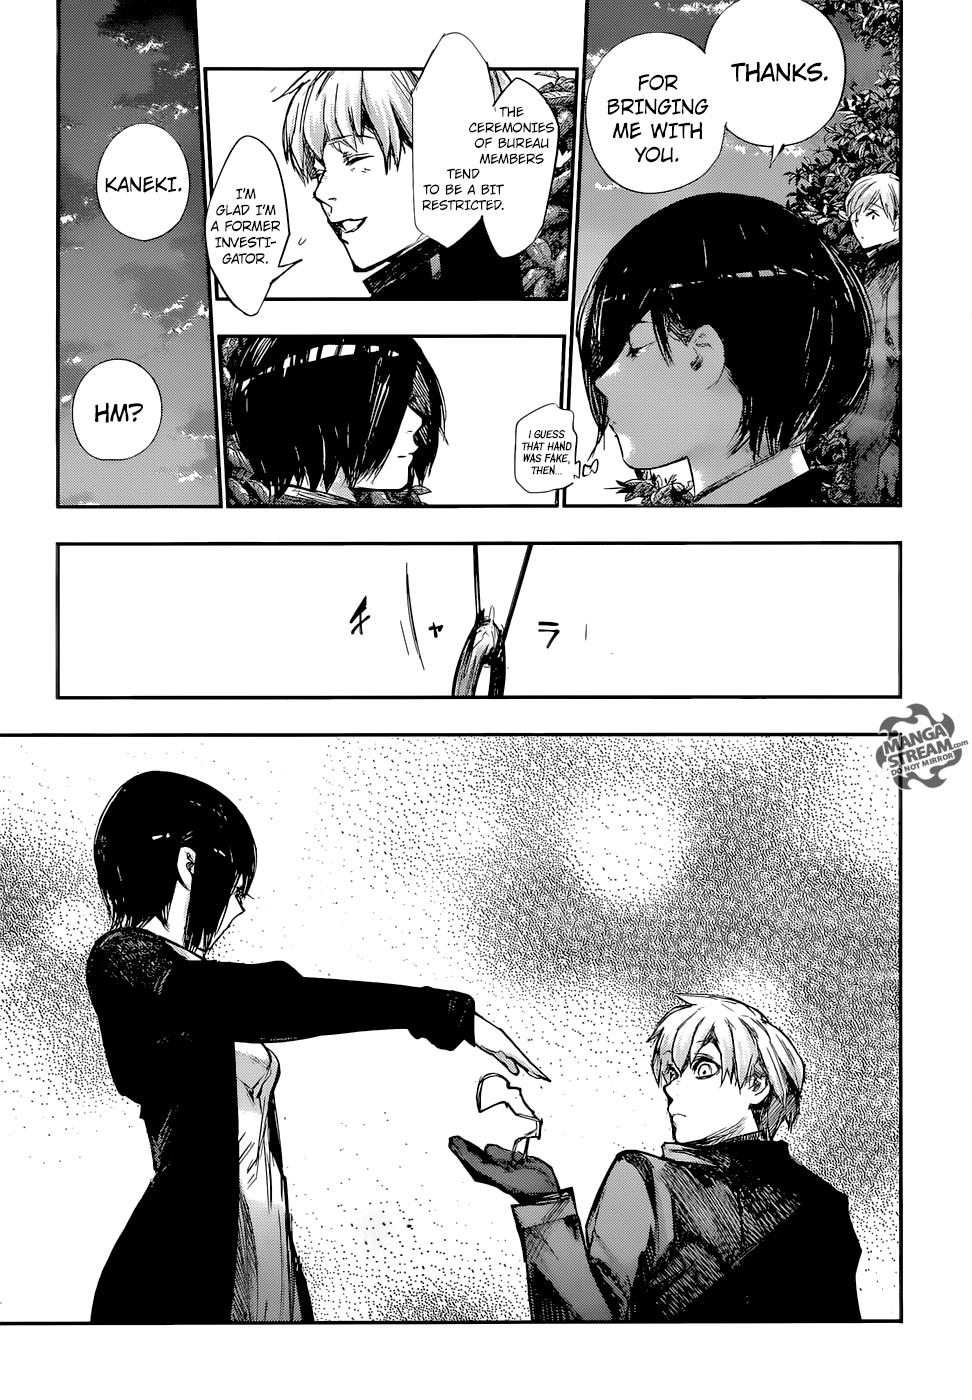 young lesbians fisting